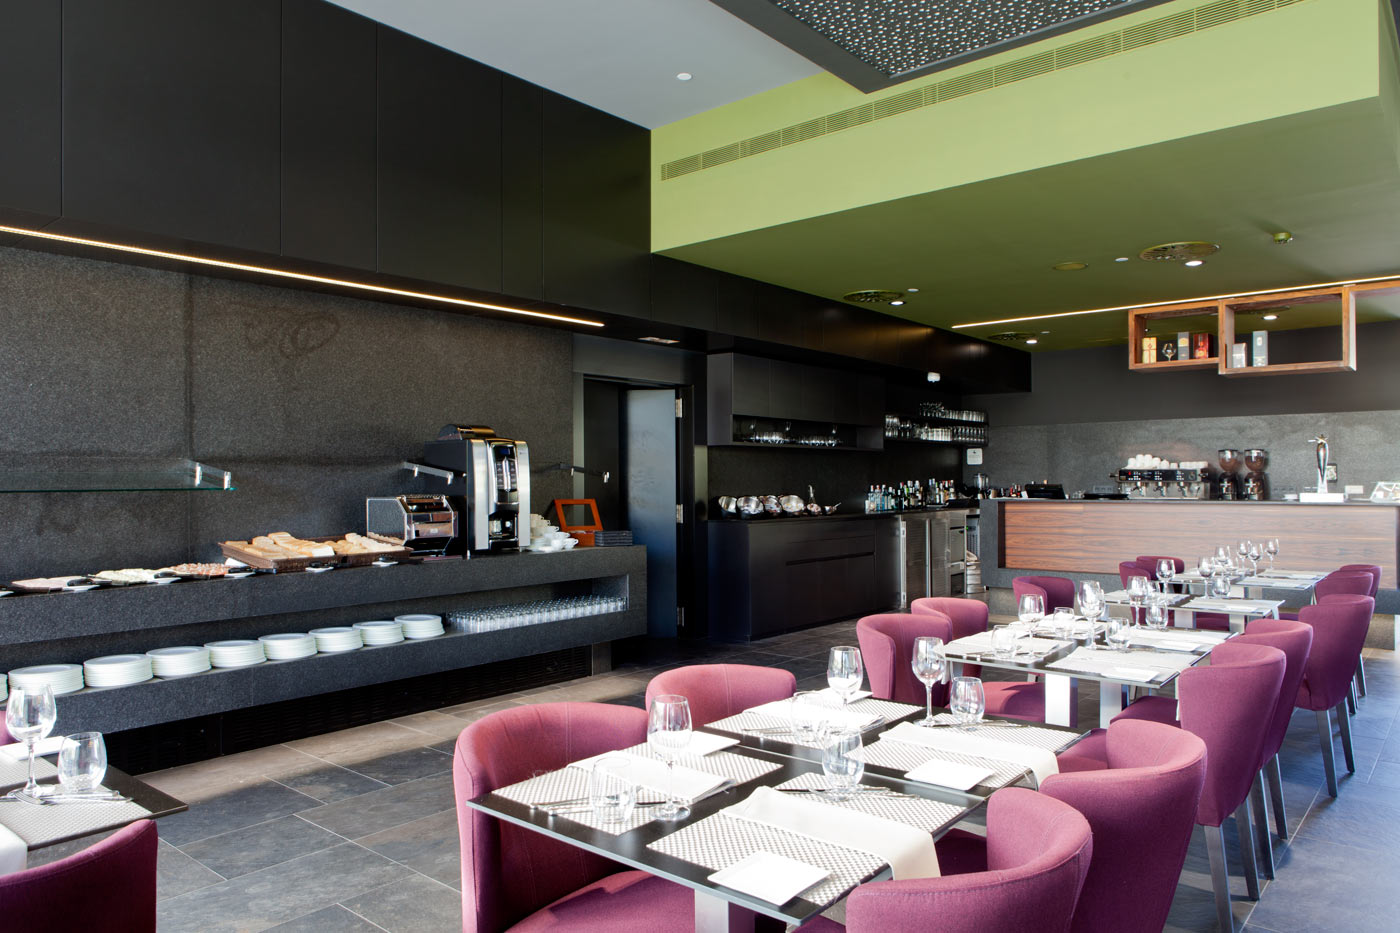 Restaurante punt i coma del hotel plaza europa barcelona - Restaurante al punt ...